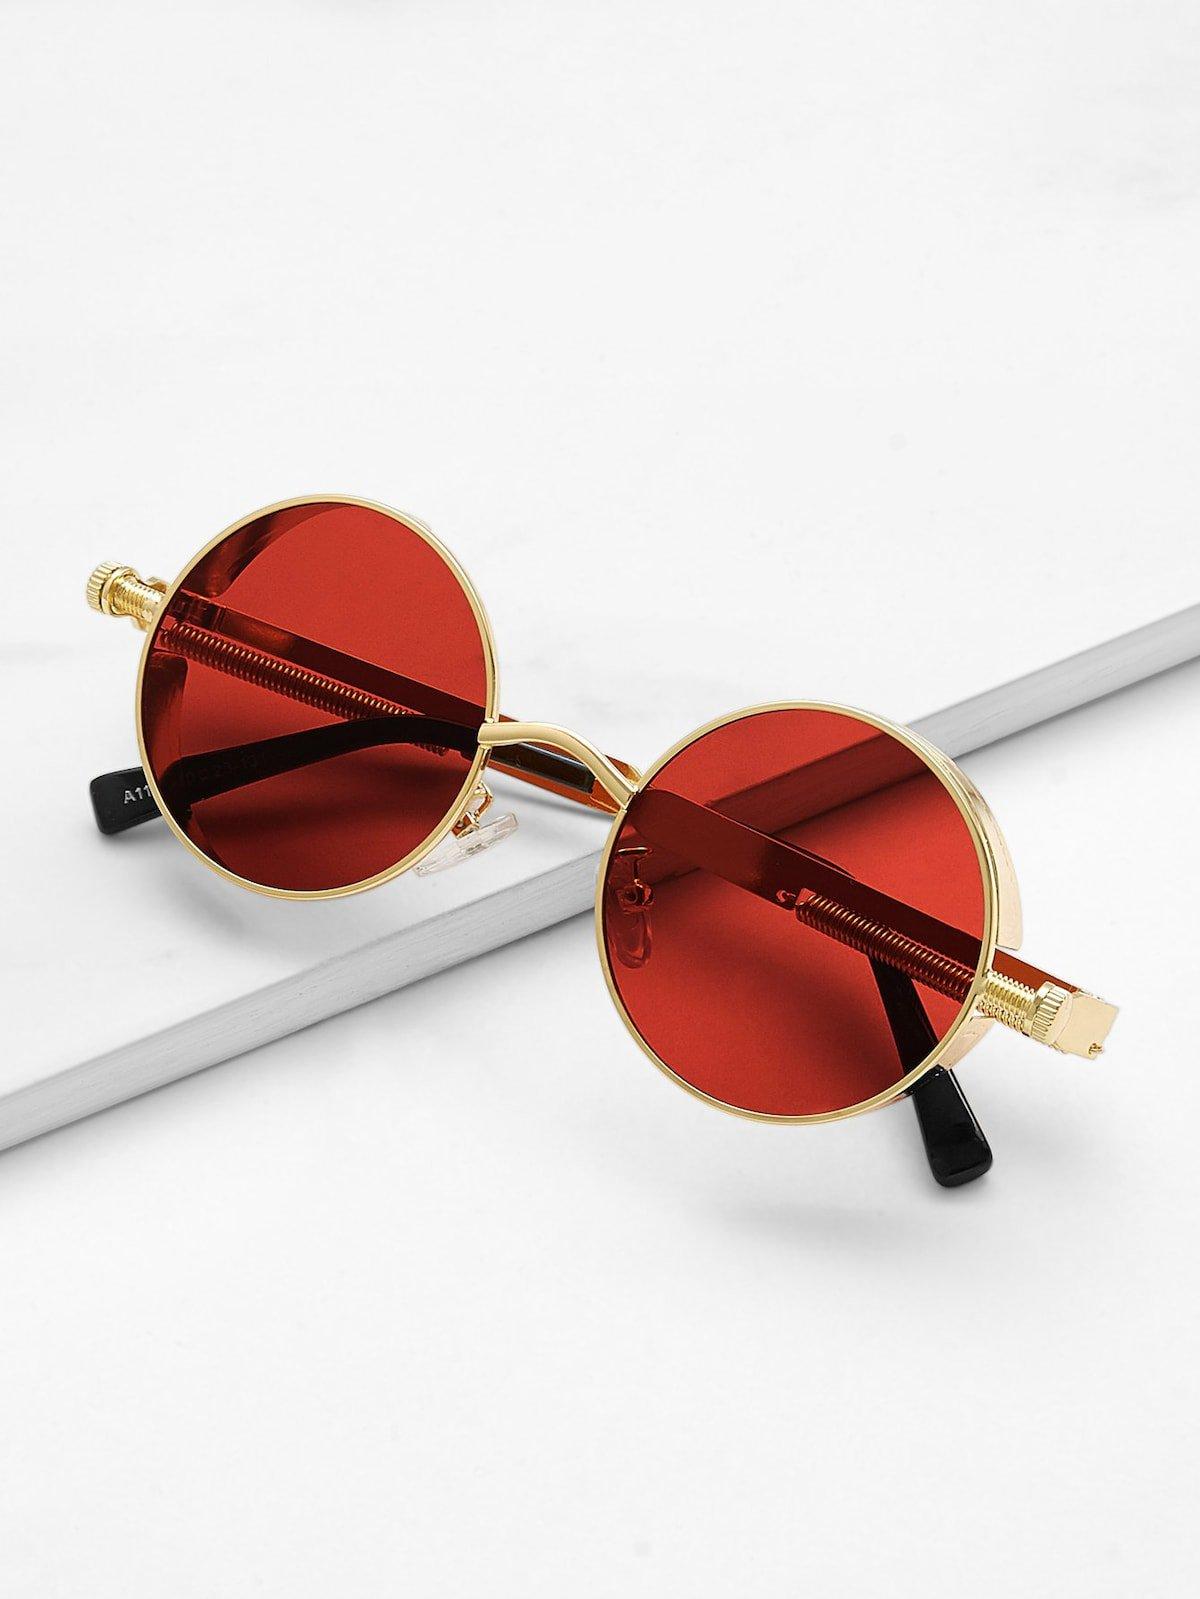 Metal Frame Round Lens Sunglasses | ROMWE